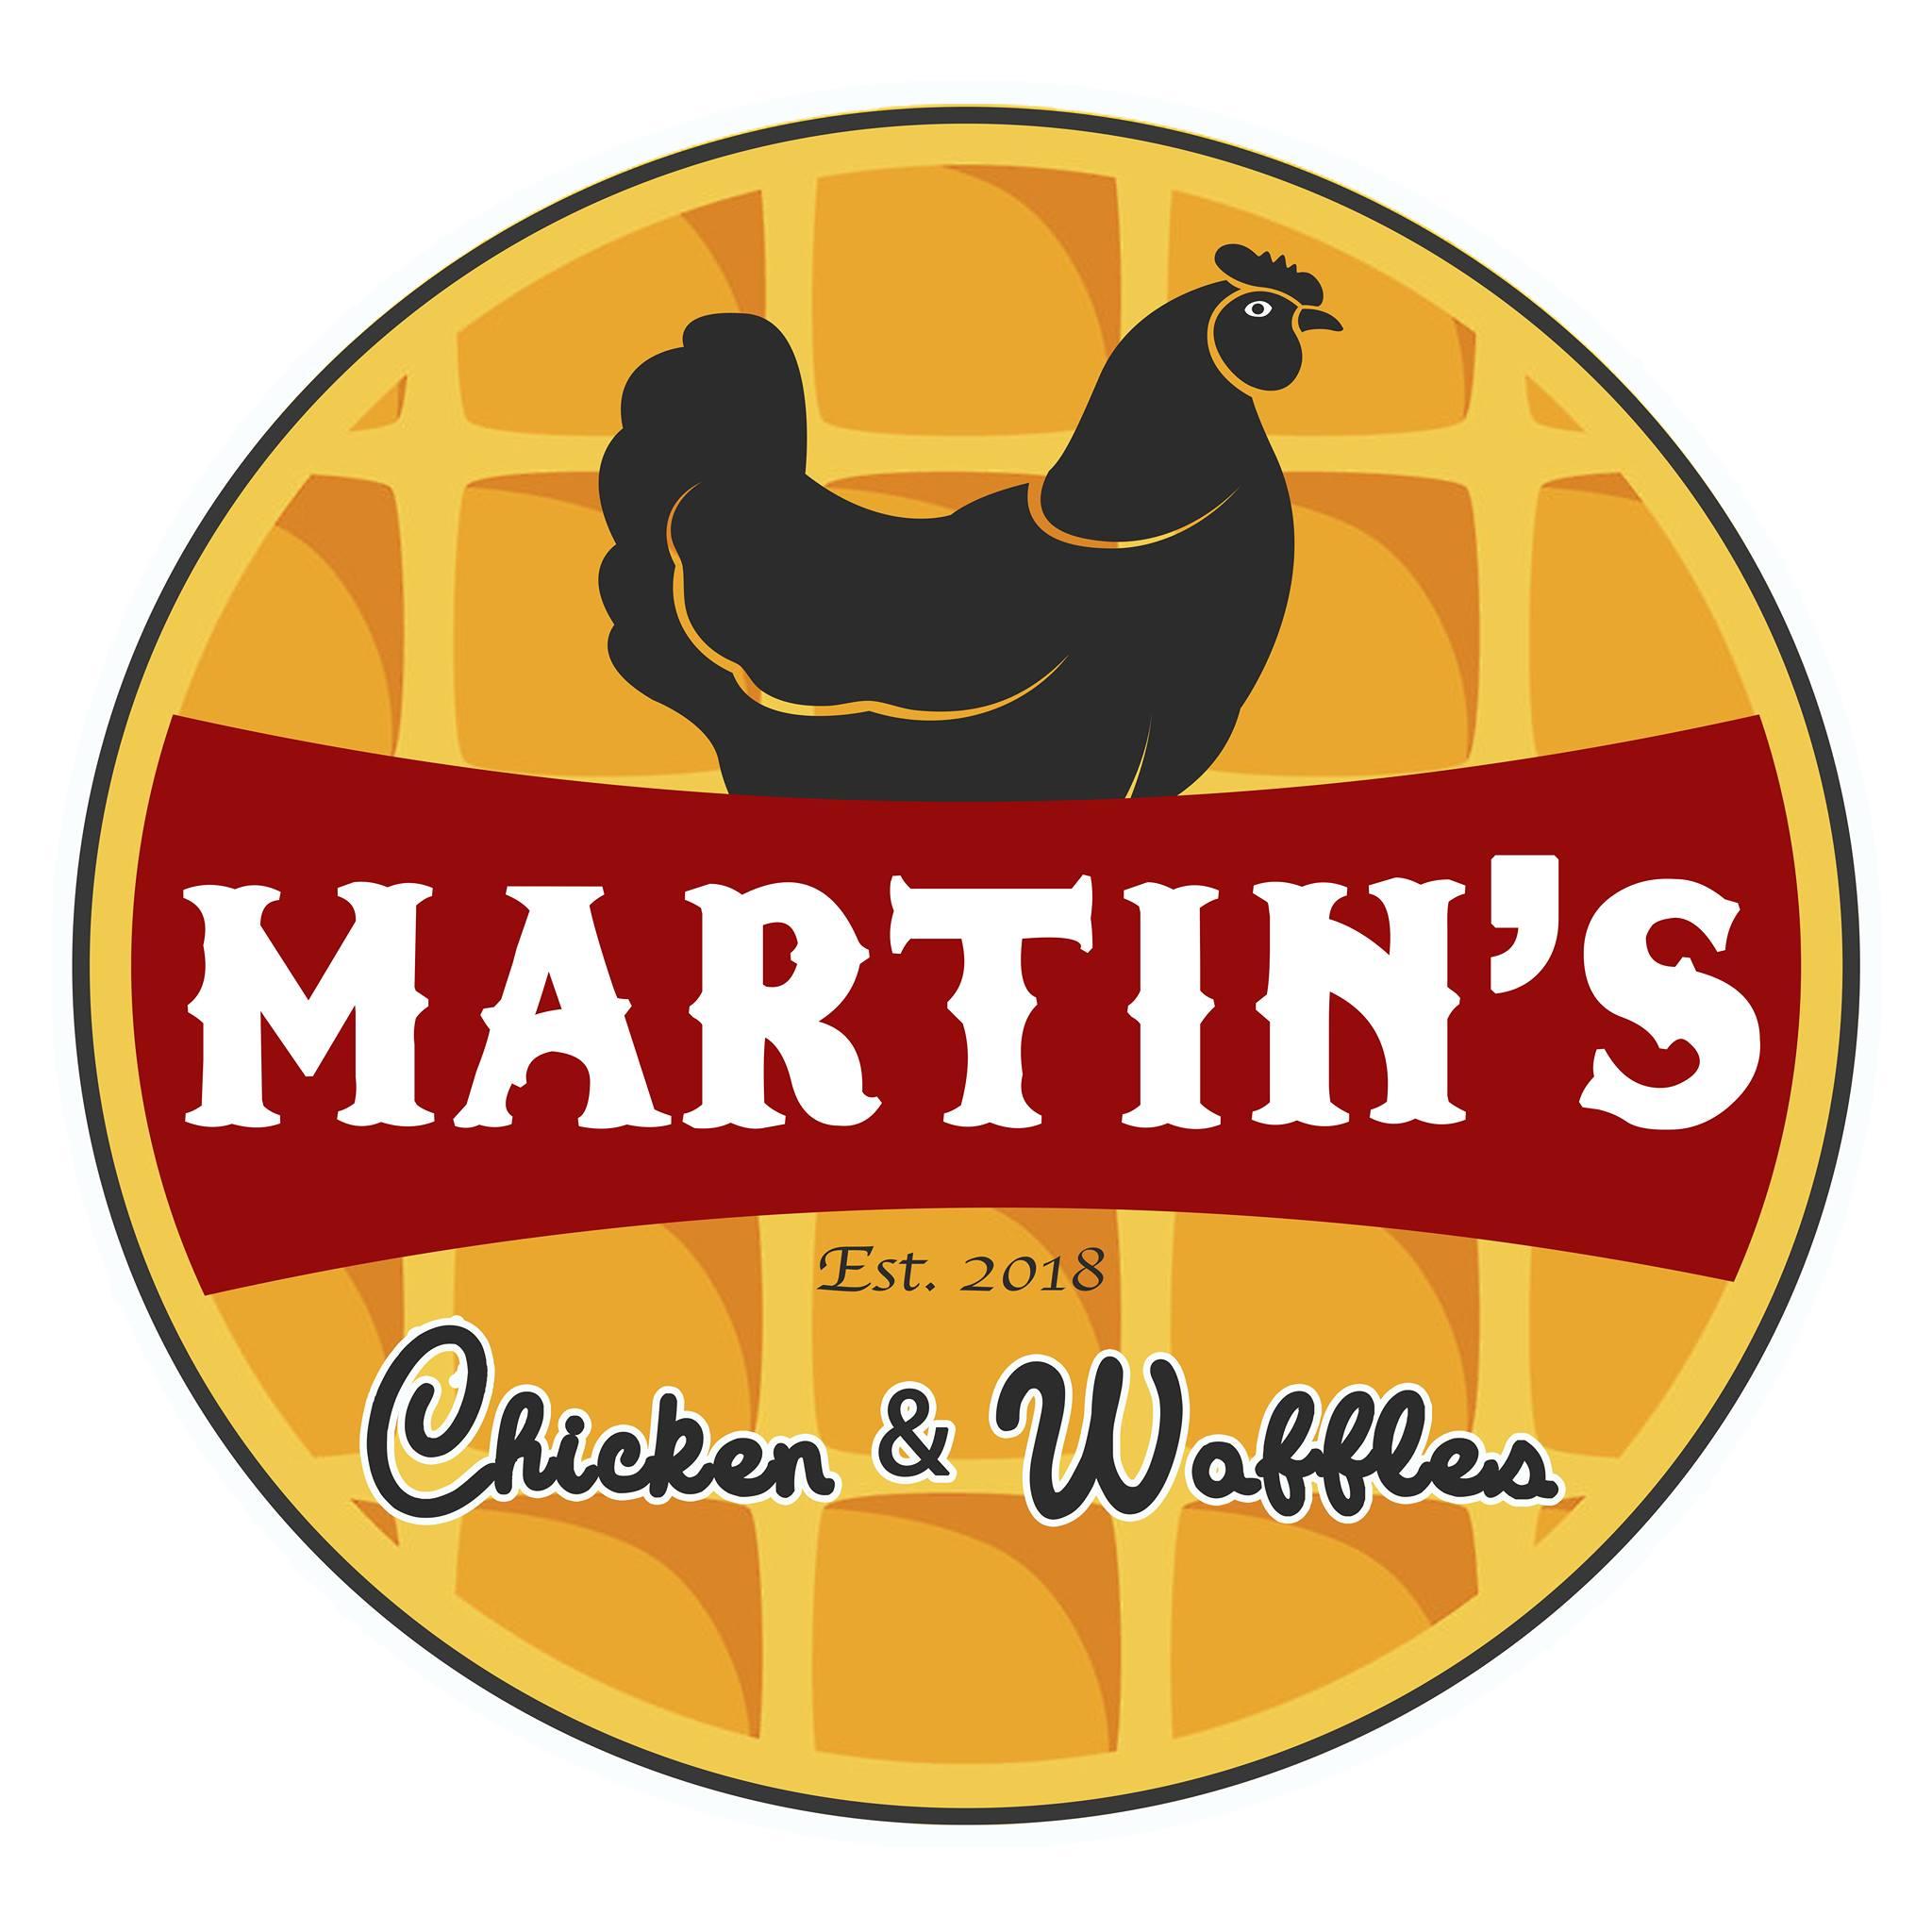 Martin's Chicken & Waffles